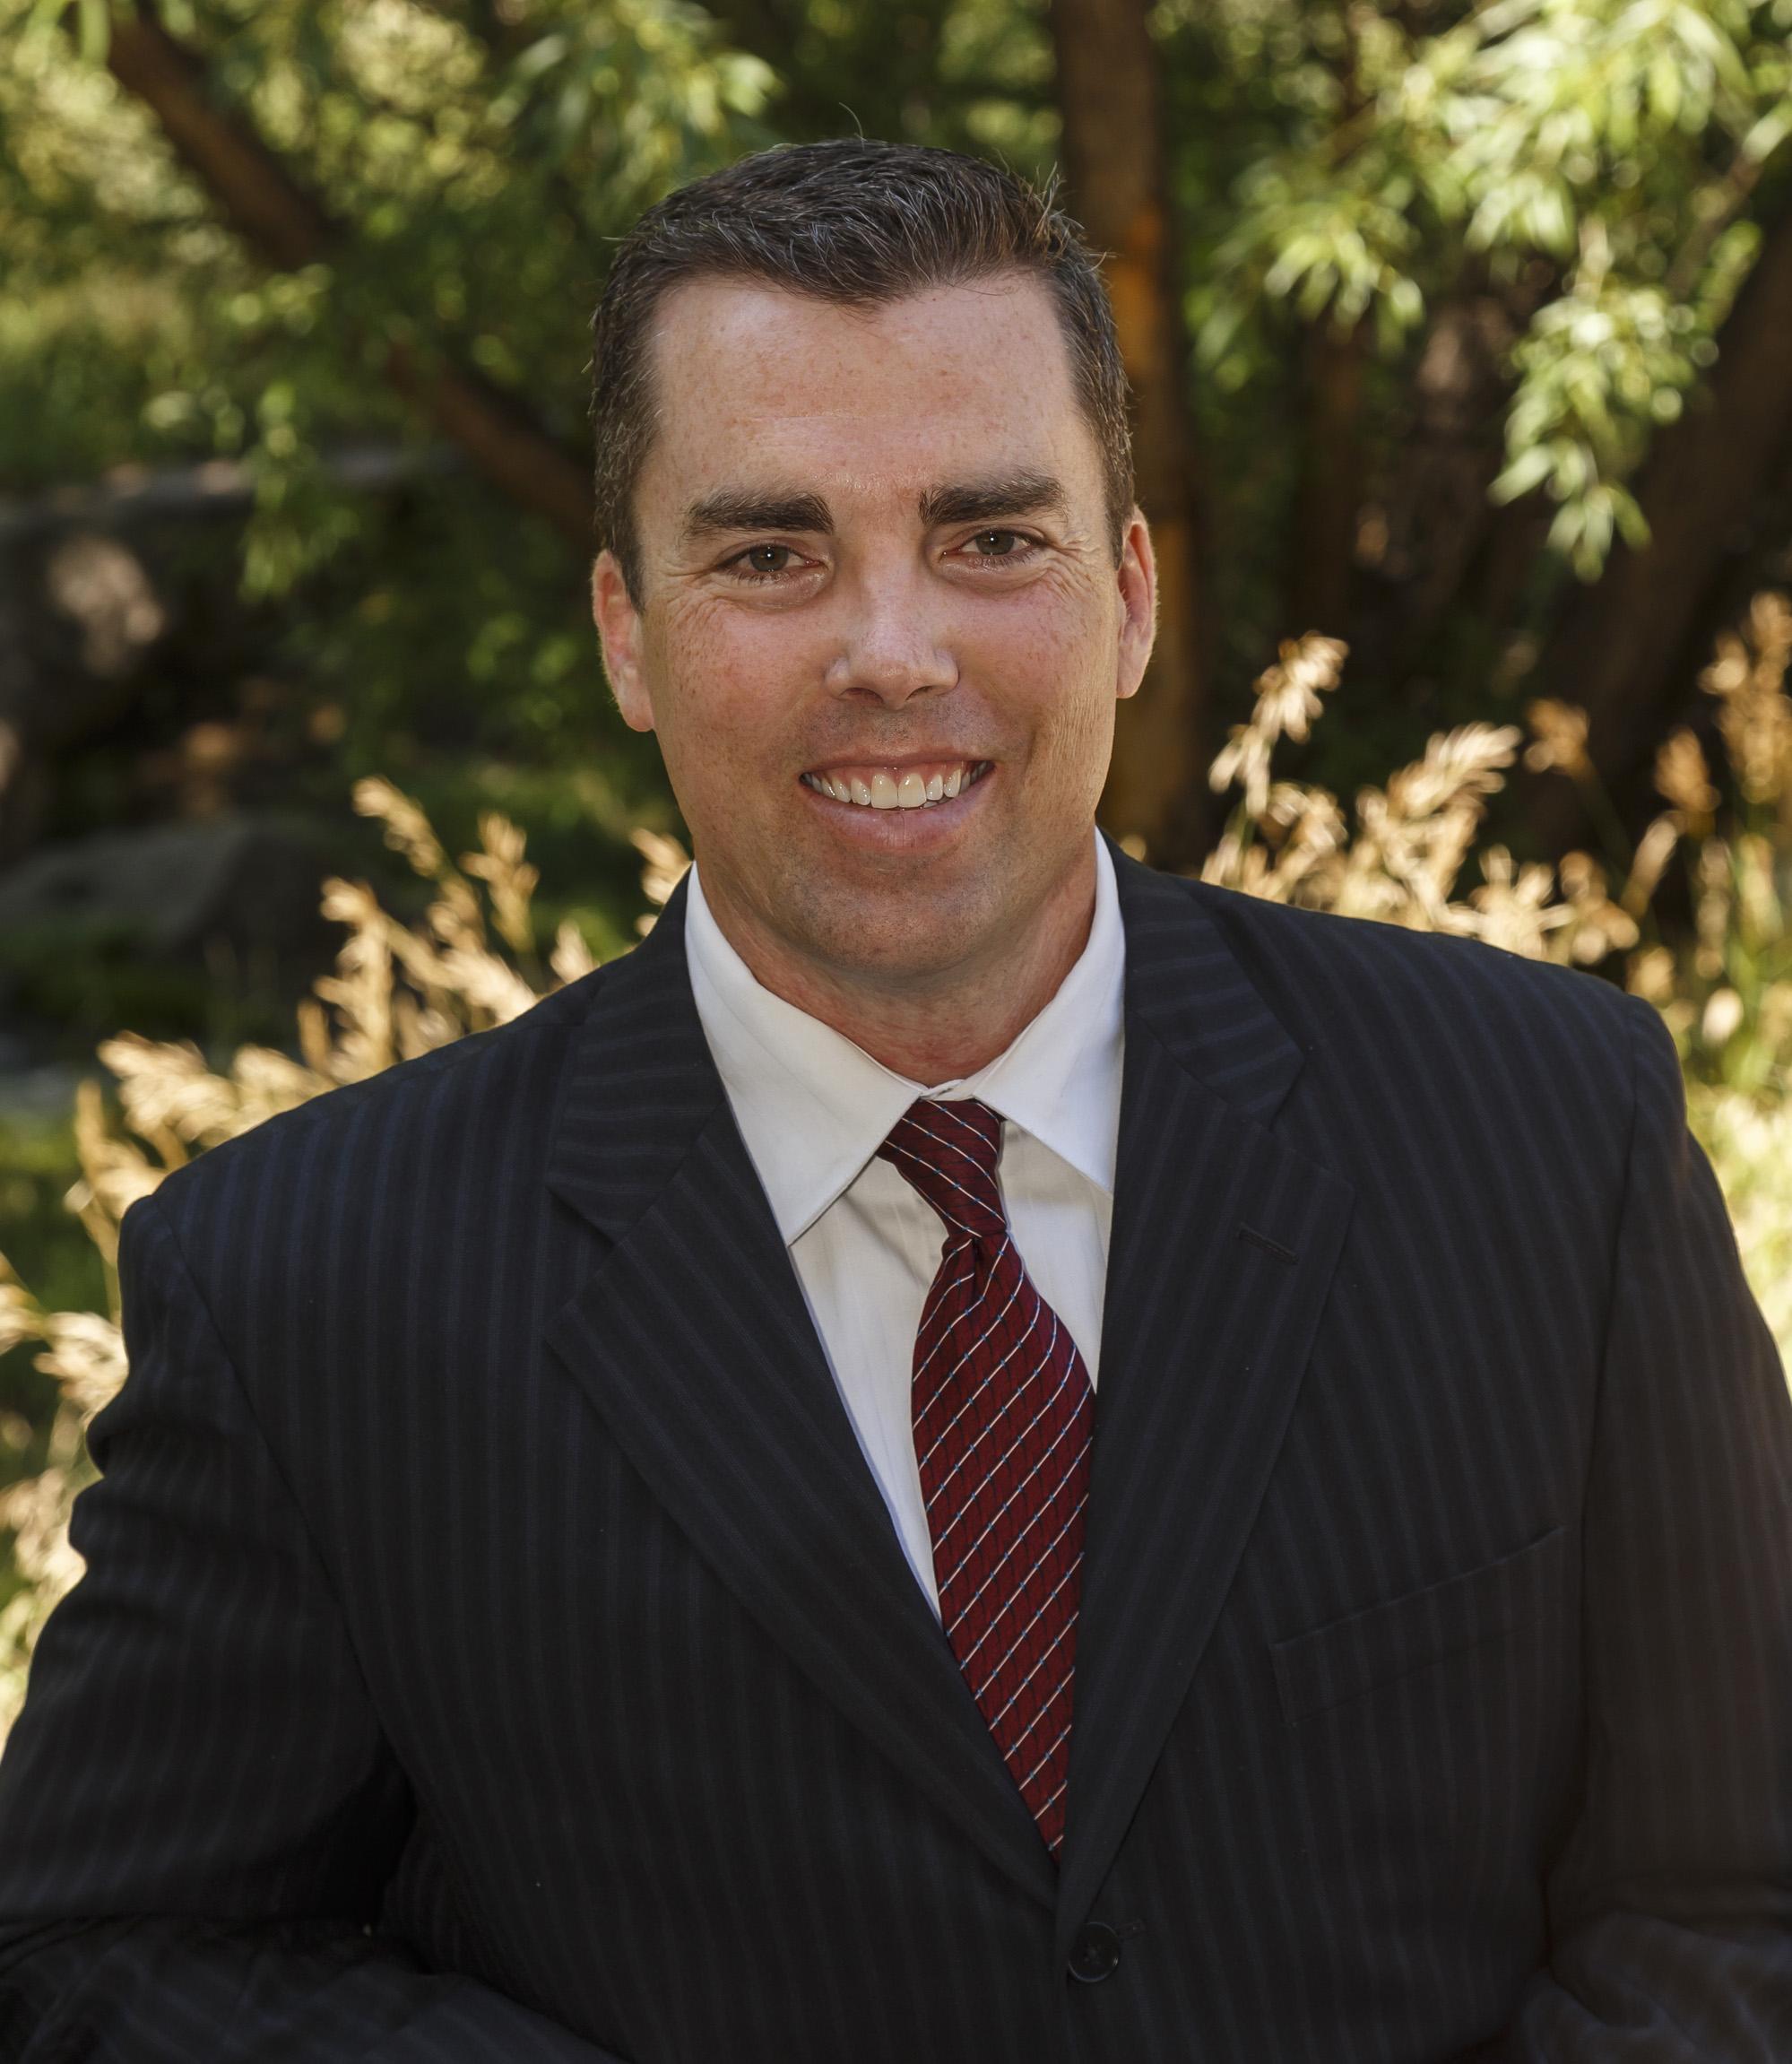 Attorney Kevin Ellmann